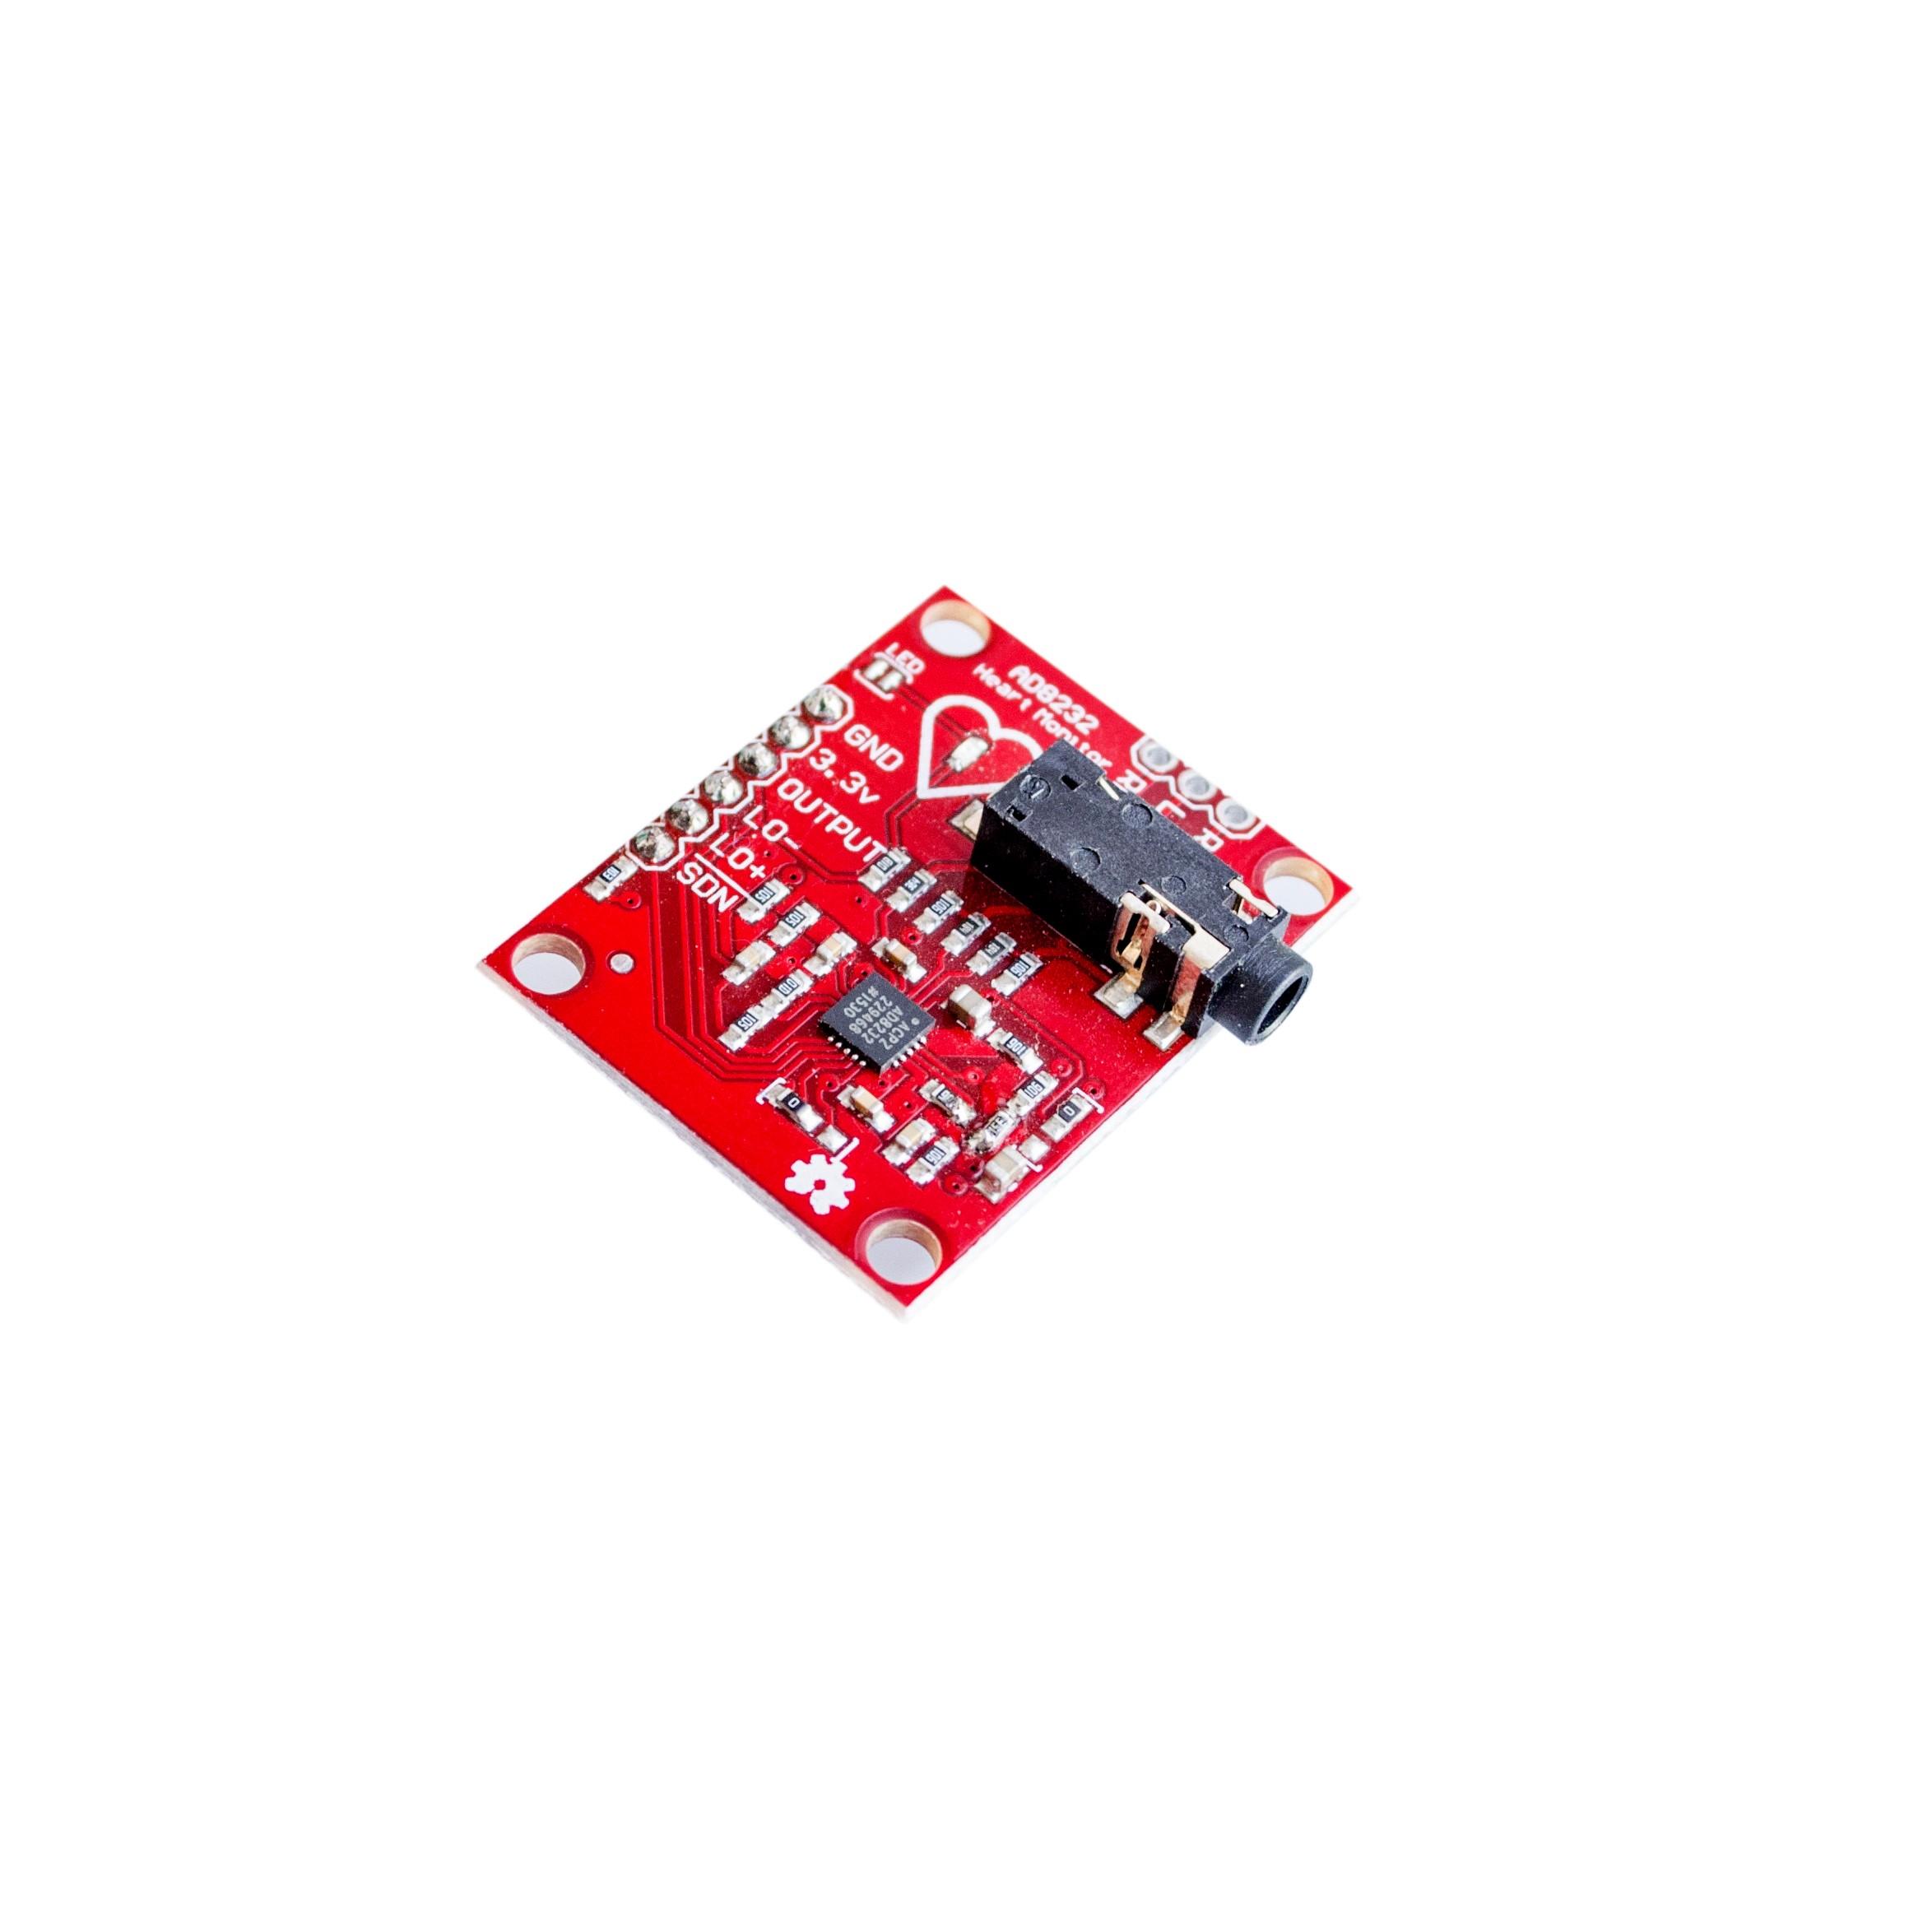 AD8232 ECG pulse heart measurement module